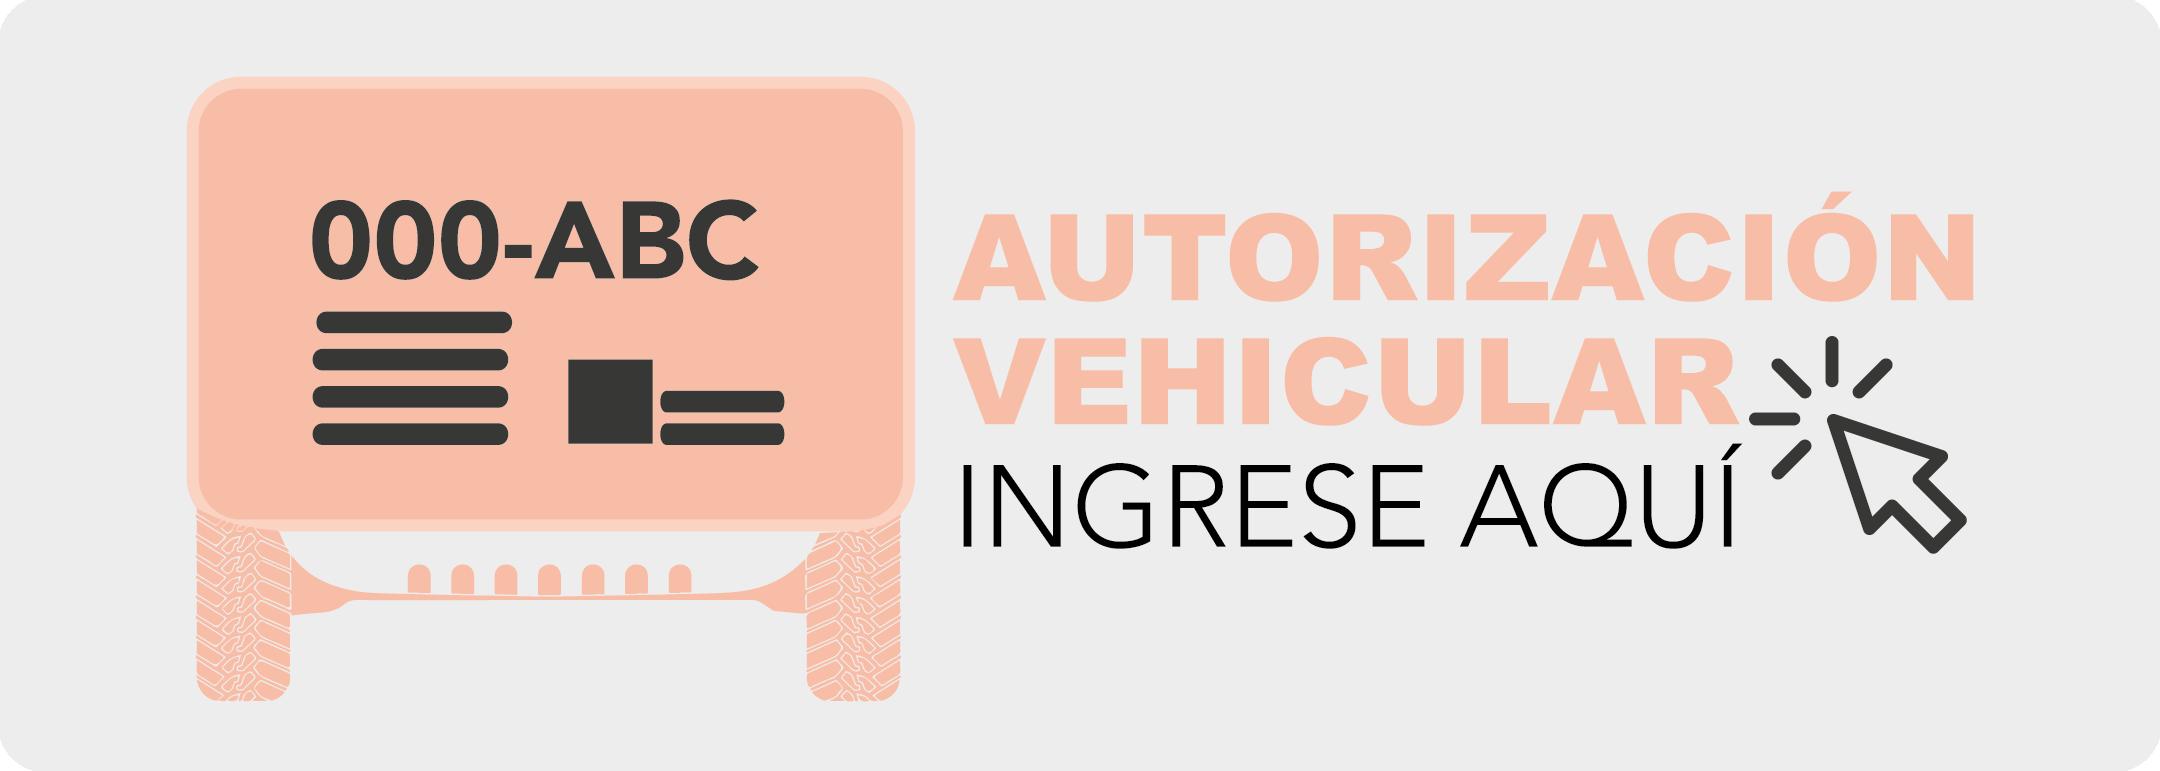 autorizacion-vehicular